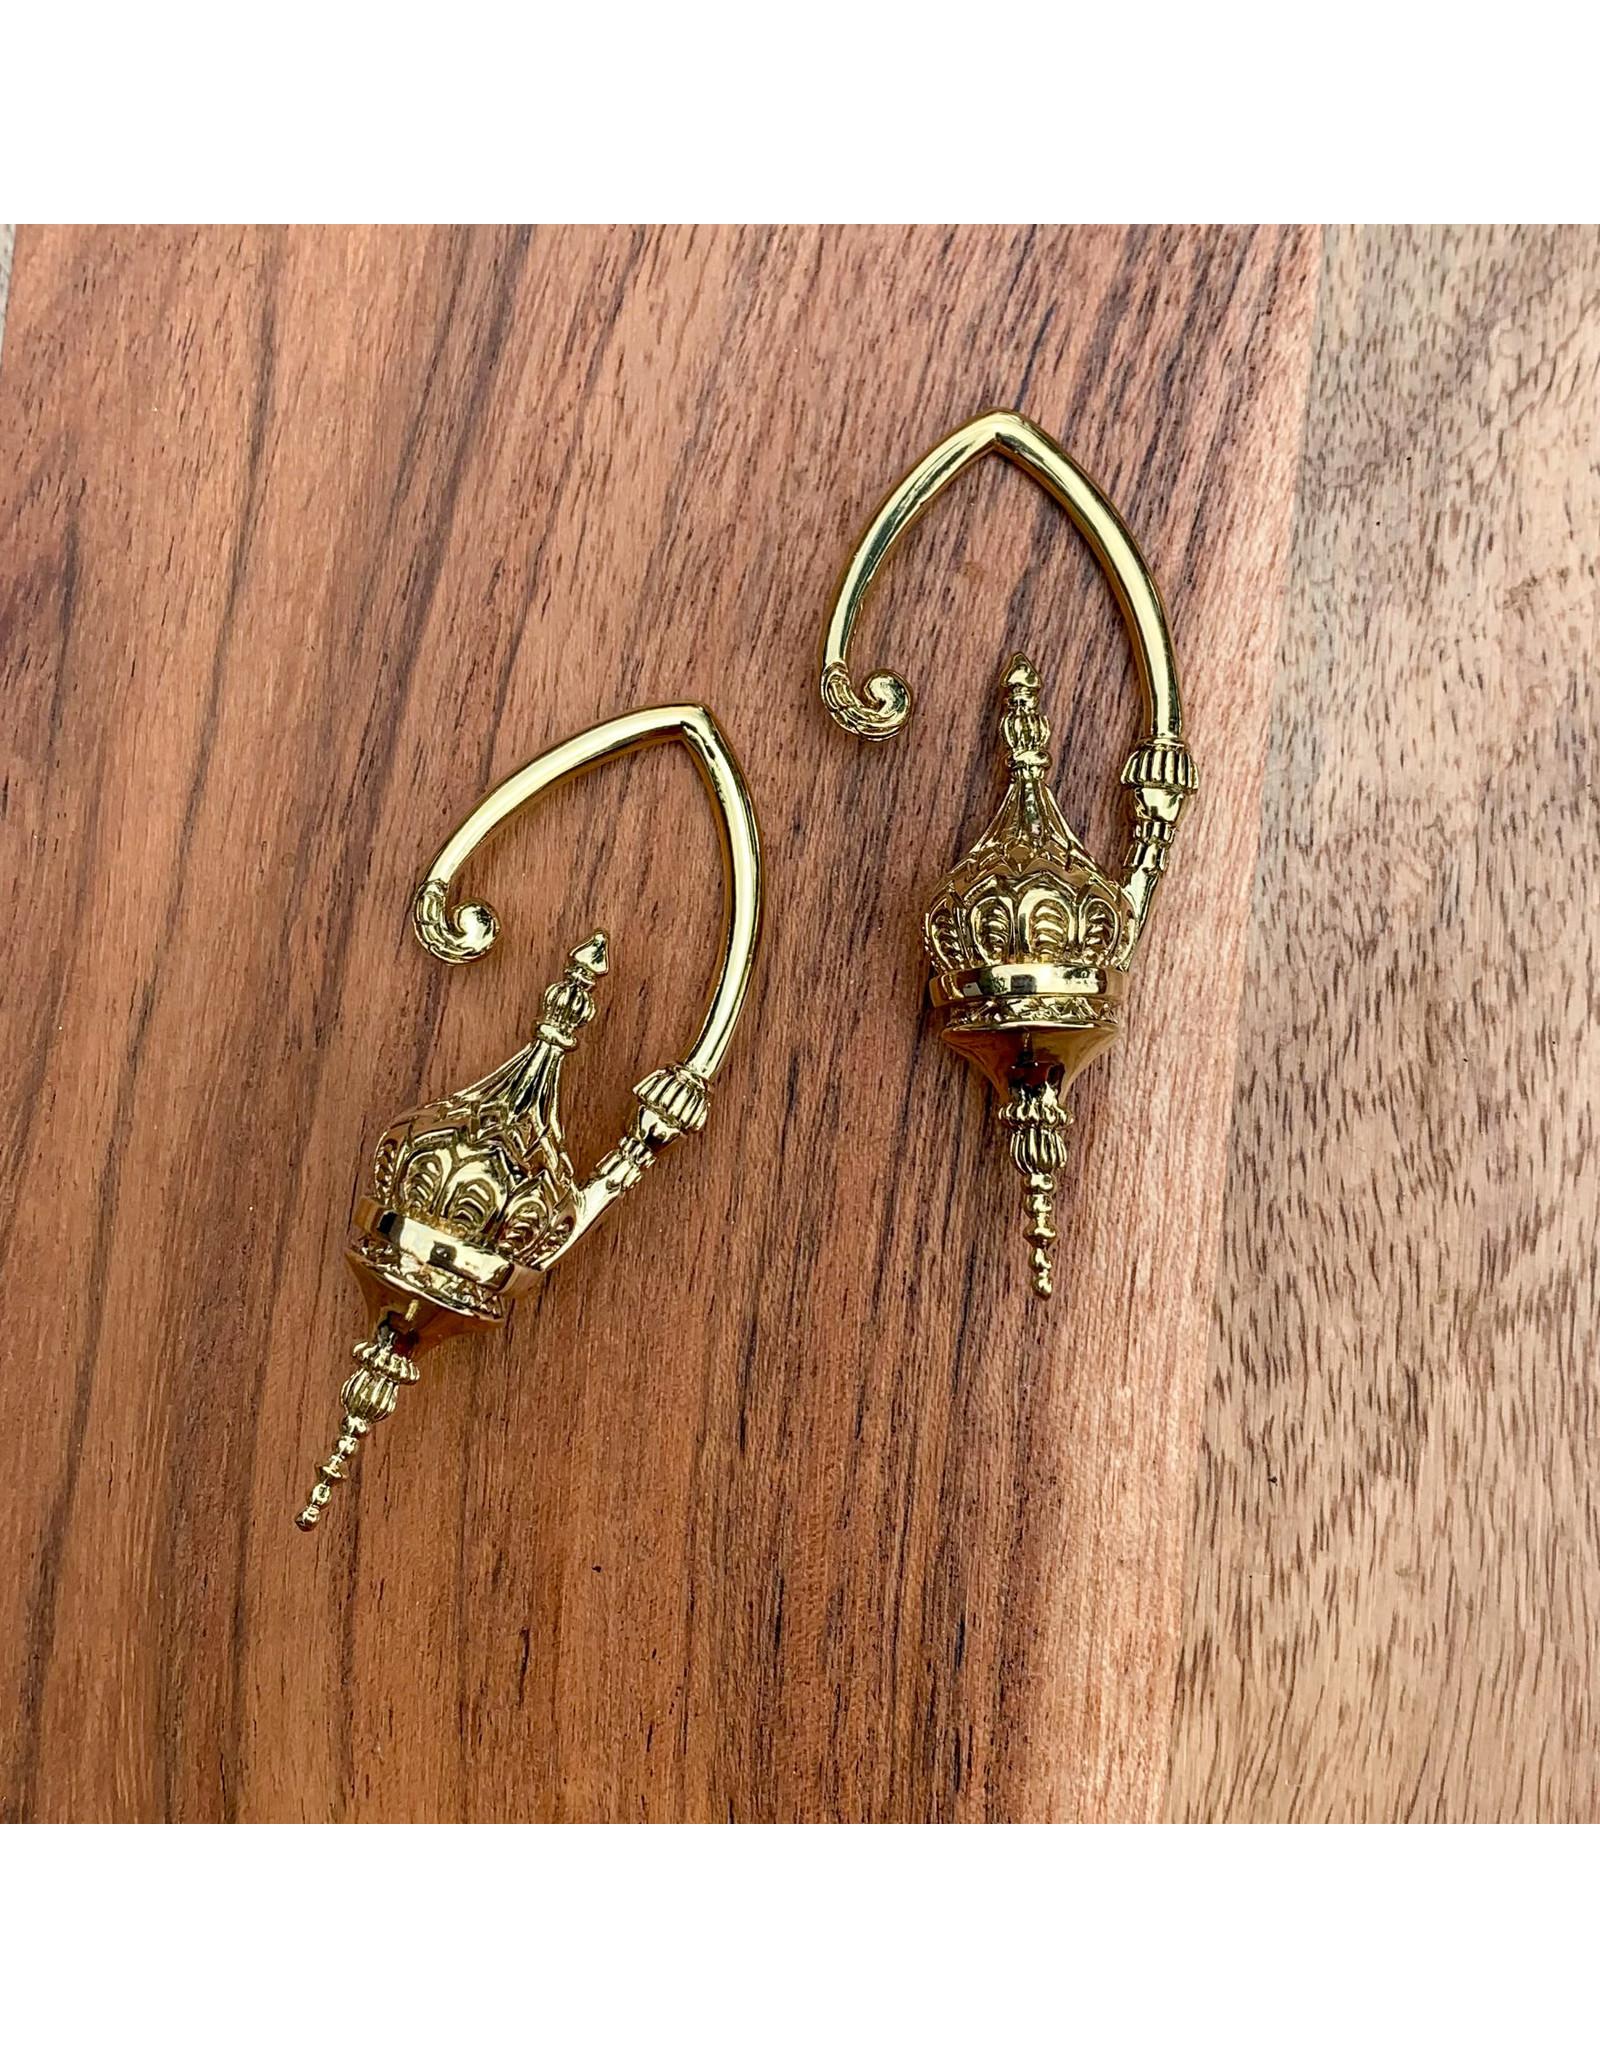 "Diablo Organics Diablo Organics small brass ""Aurora"" hanging design"